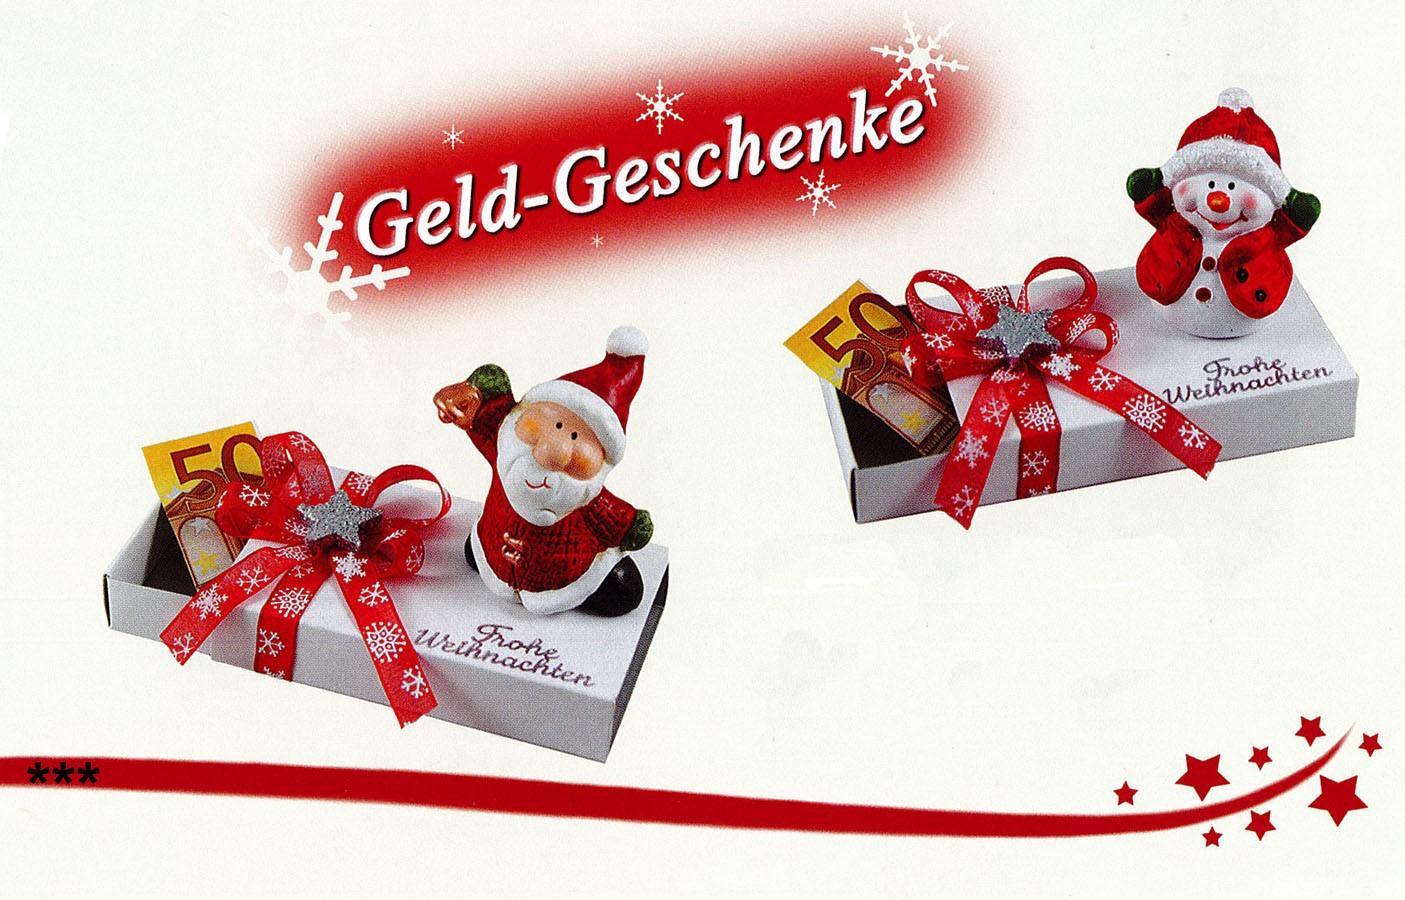 Geld-Geschenk Schachtel LBH: 1x6,5x9 cm